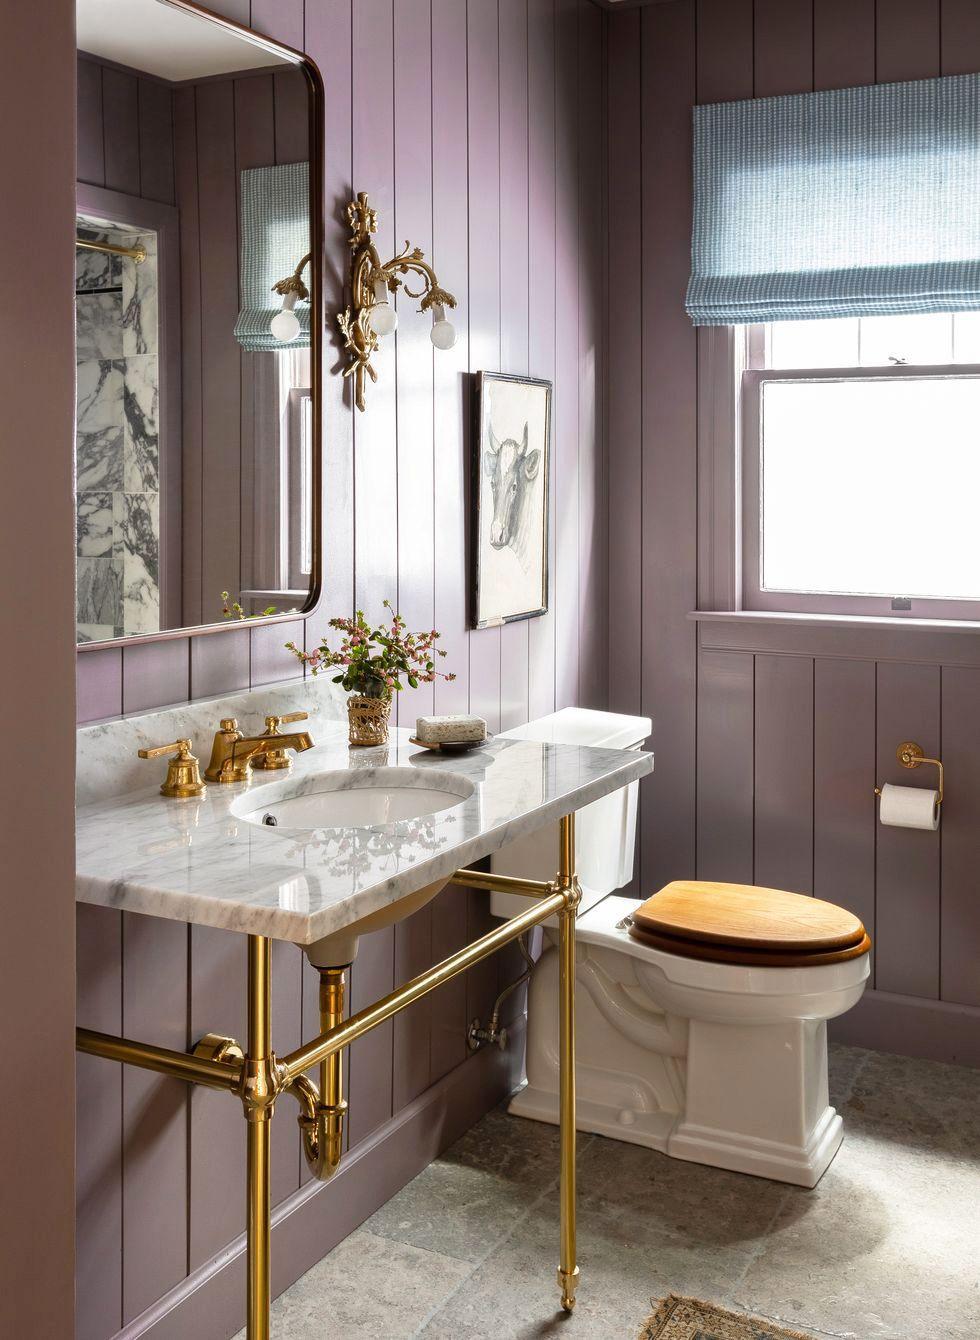 35 Design Ideas That Will Make Small Bathrooms Feel So ...